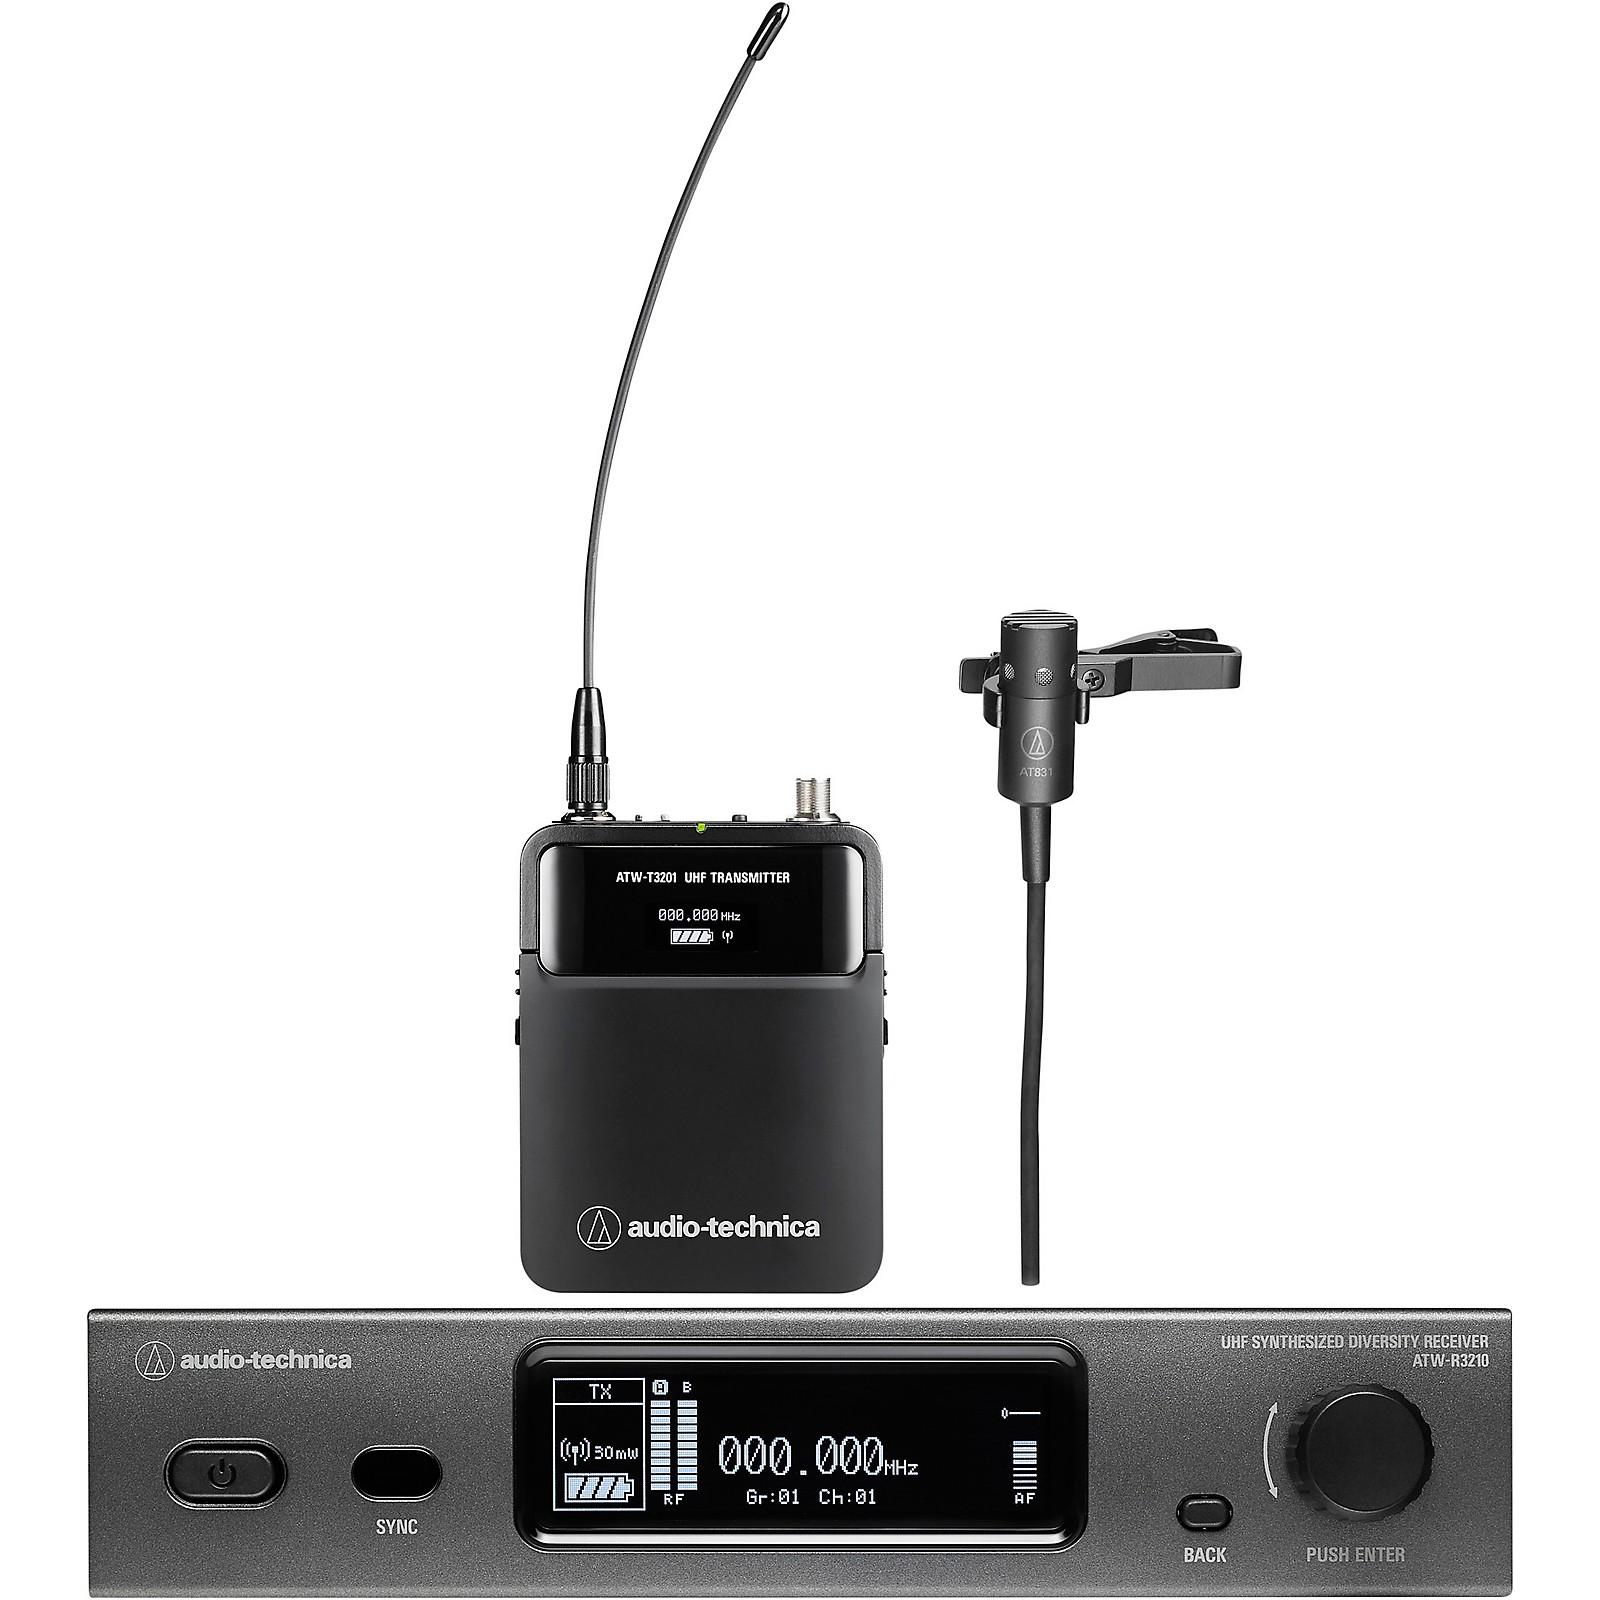 Open Box Audio-Technica Audio-Technica ATW-3211/831 3000 Series Frequency-agile True Diversity UHF Wireless Systems